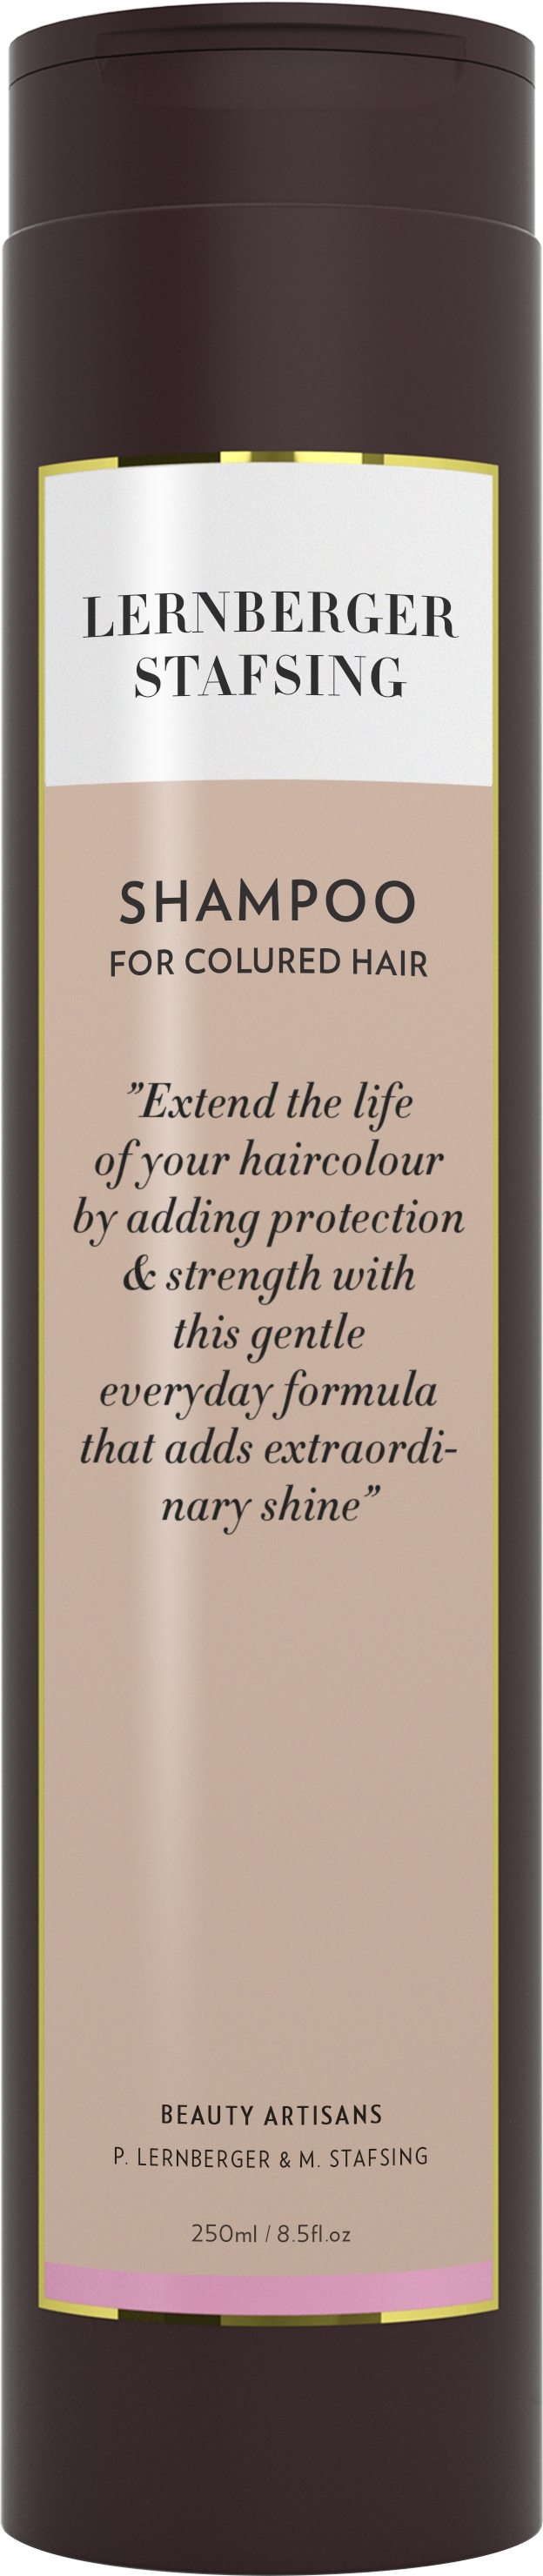 Lernberger Stafsing For Coloured Hair Shampoo, 250 ml